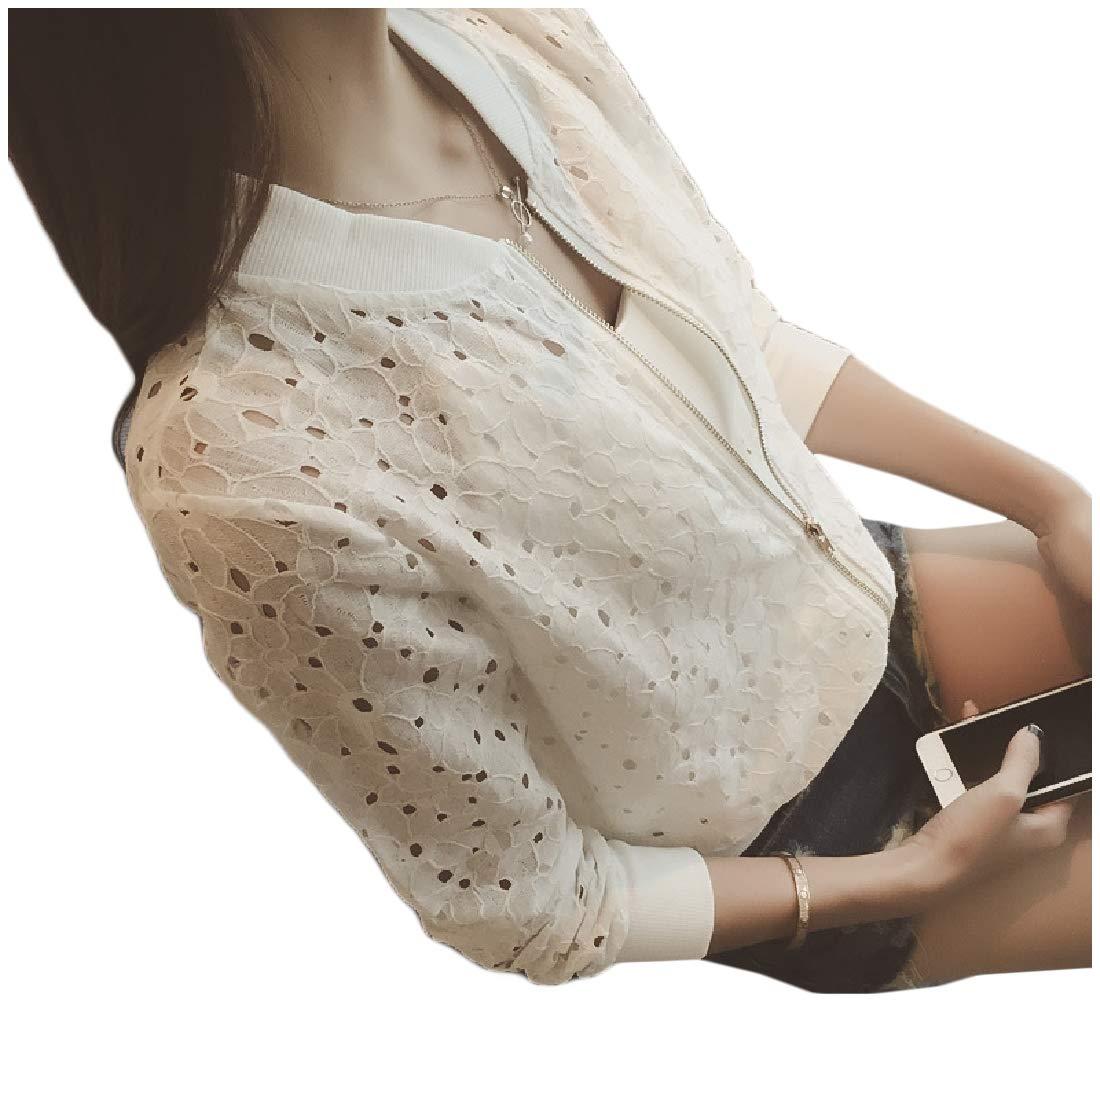 Winwinus Women Hollow Out Weekend Zip Long-Sleeve Stand Collar Outwear Jacket White S